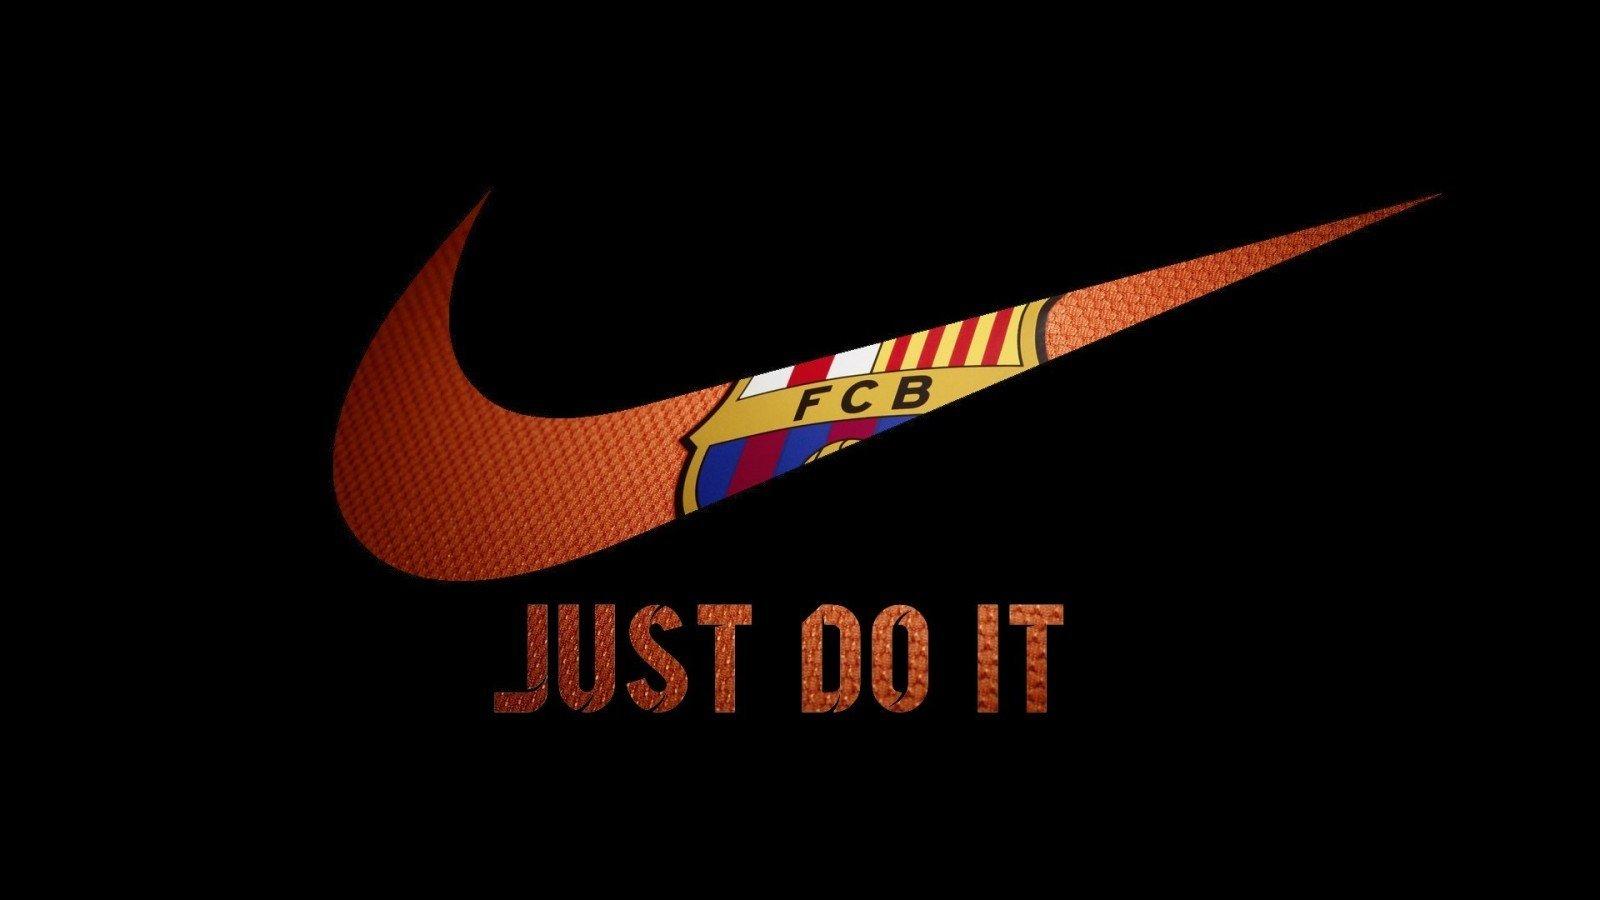 Wallpaper : 1600x900 px, FC Barcelona 1600x900 - goodfon ...